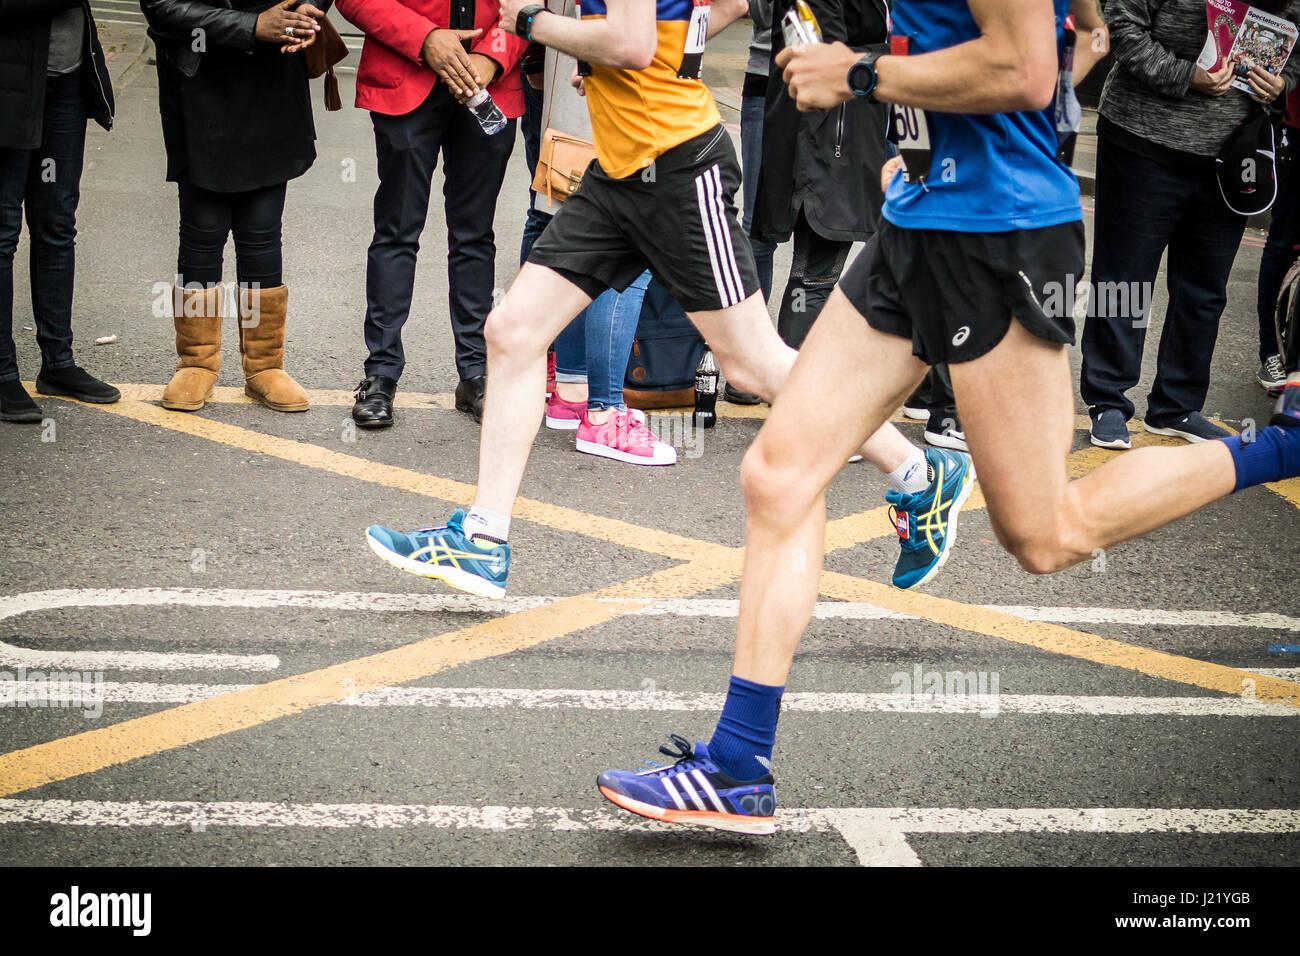 London, UK. 23rd Apr, 2017. Mass runners around the 18k point at Bermondsey Credit: Karen Hunt/Alamy Live News Stock Photo